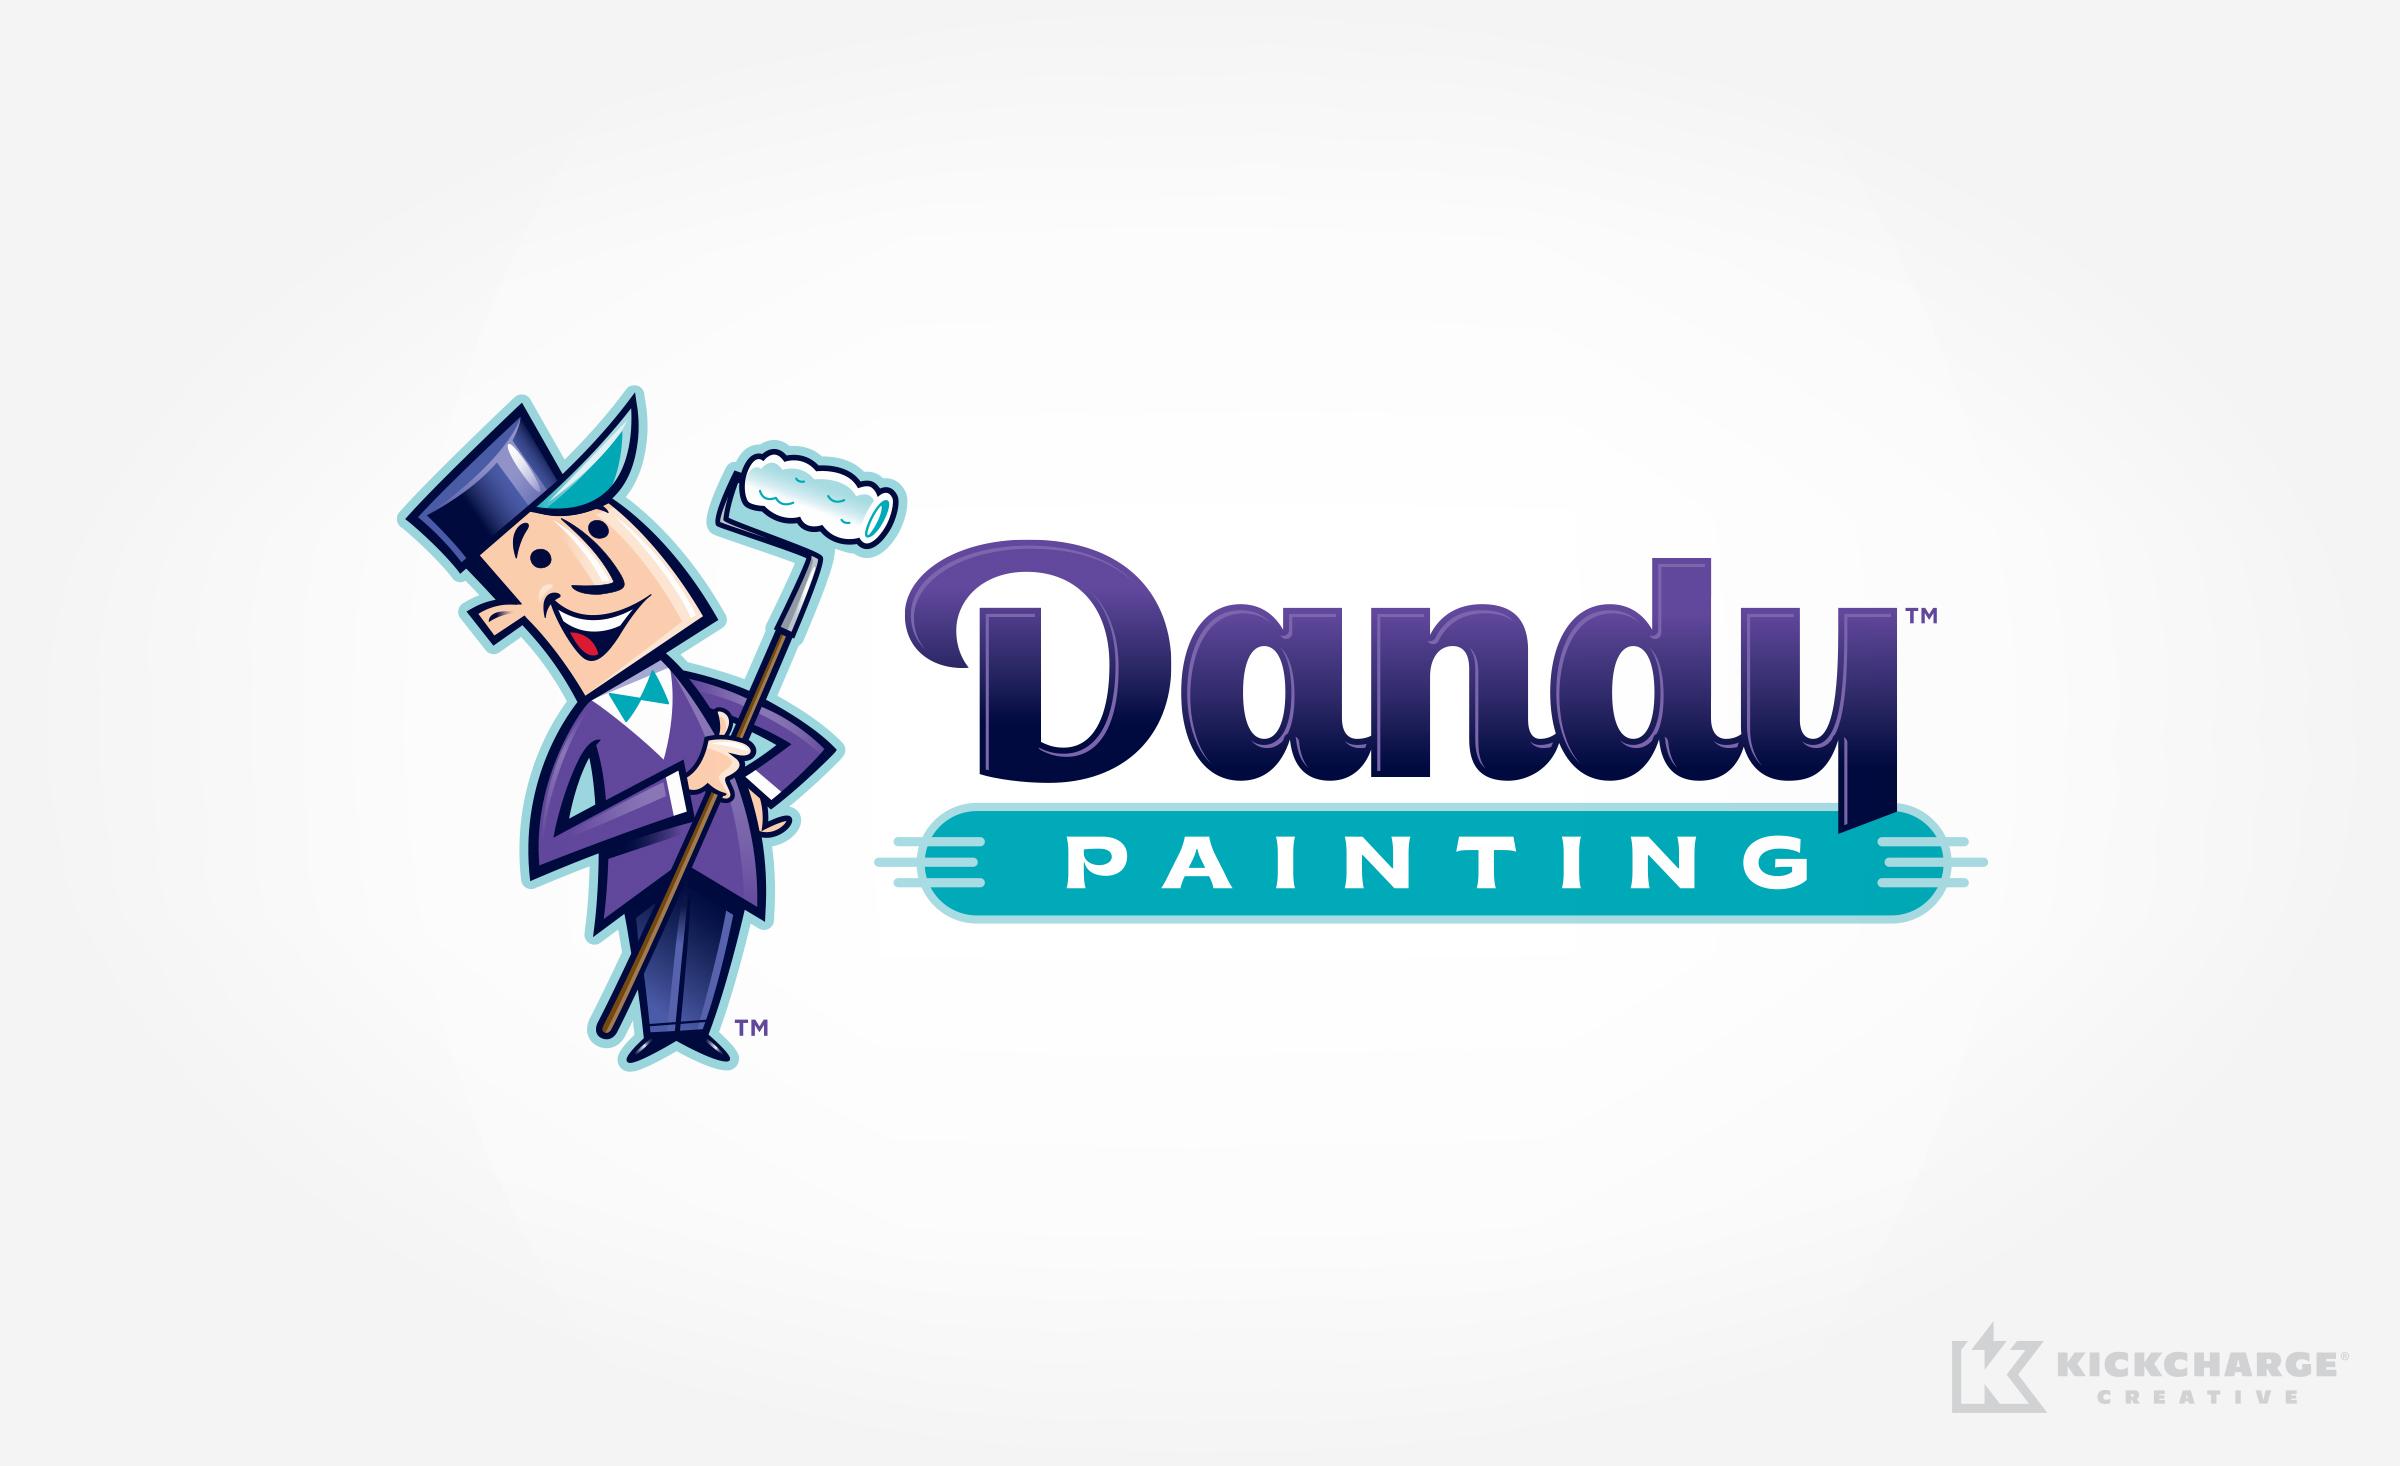 Dandy Painting